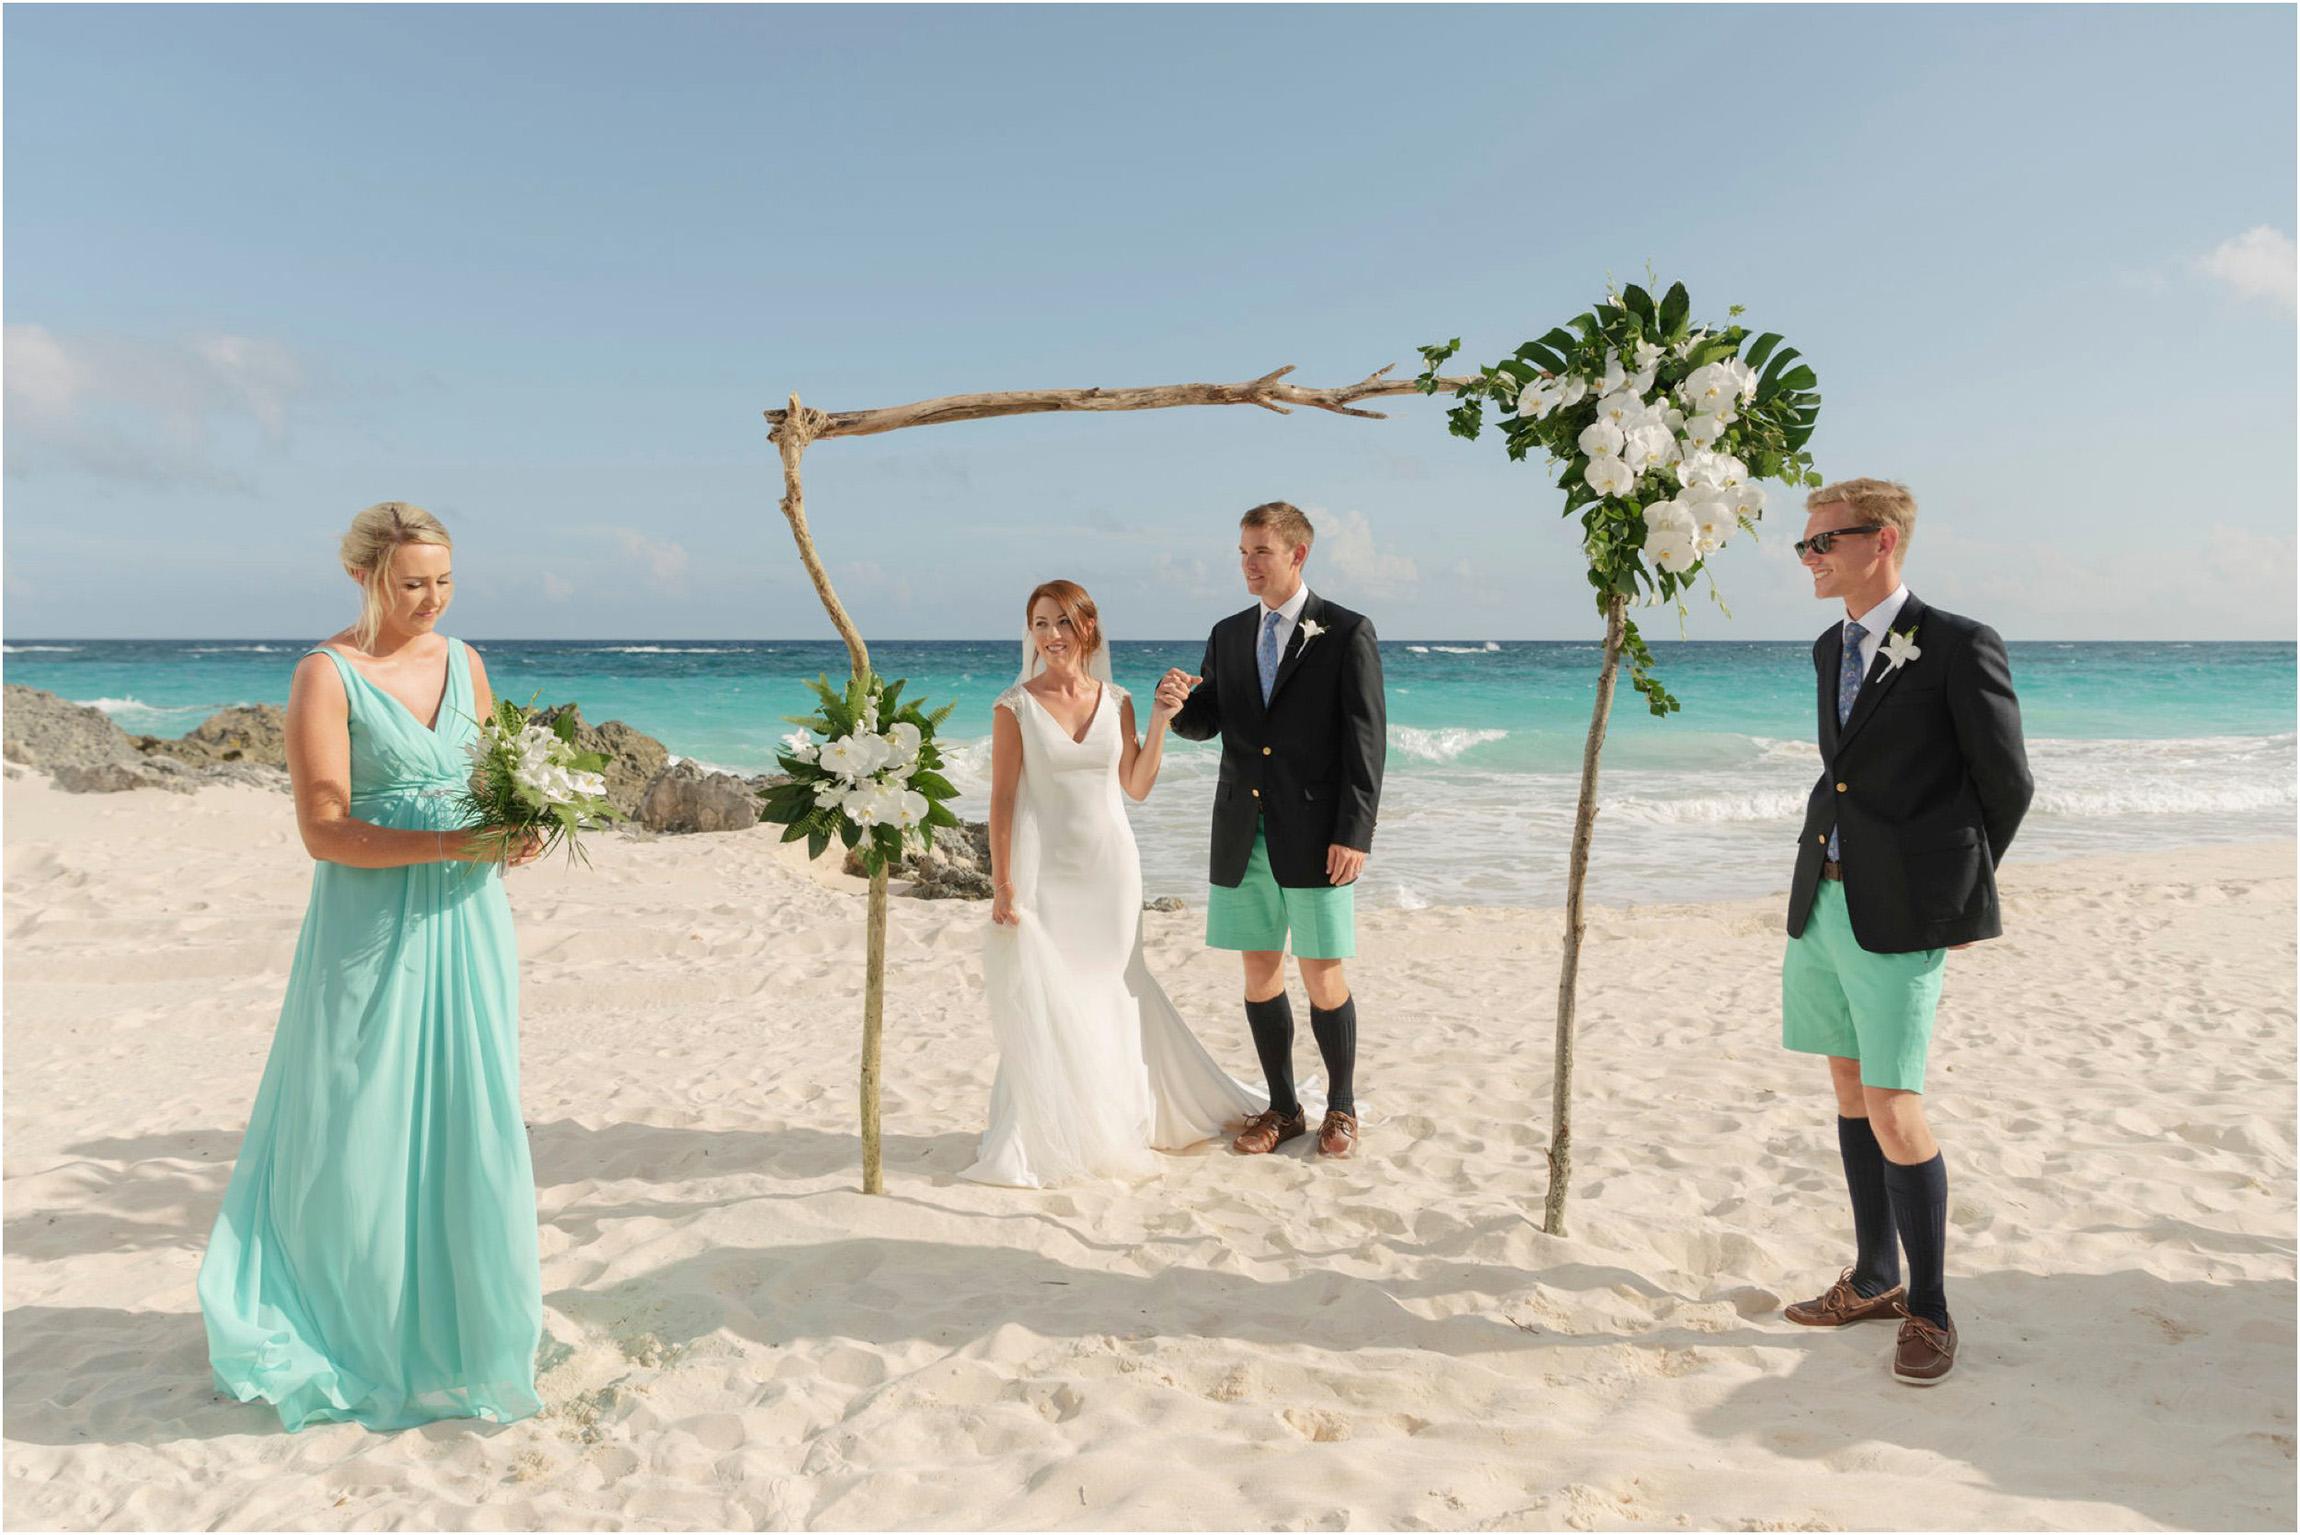 ©FianderFoto_Bermuda Wedding Photographer_Mid Ocean_Rachel_Angus_054.jpg